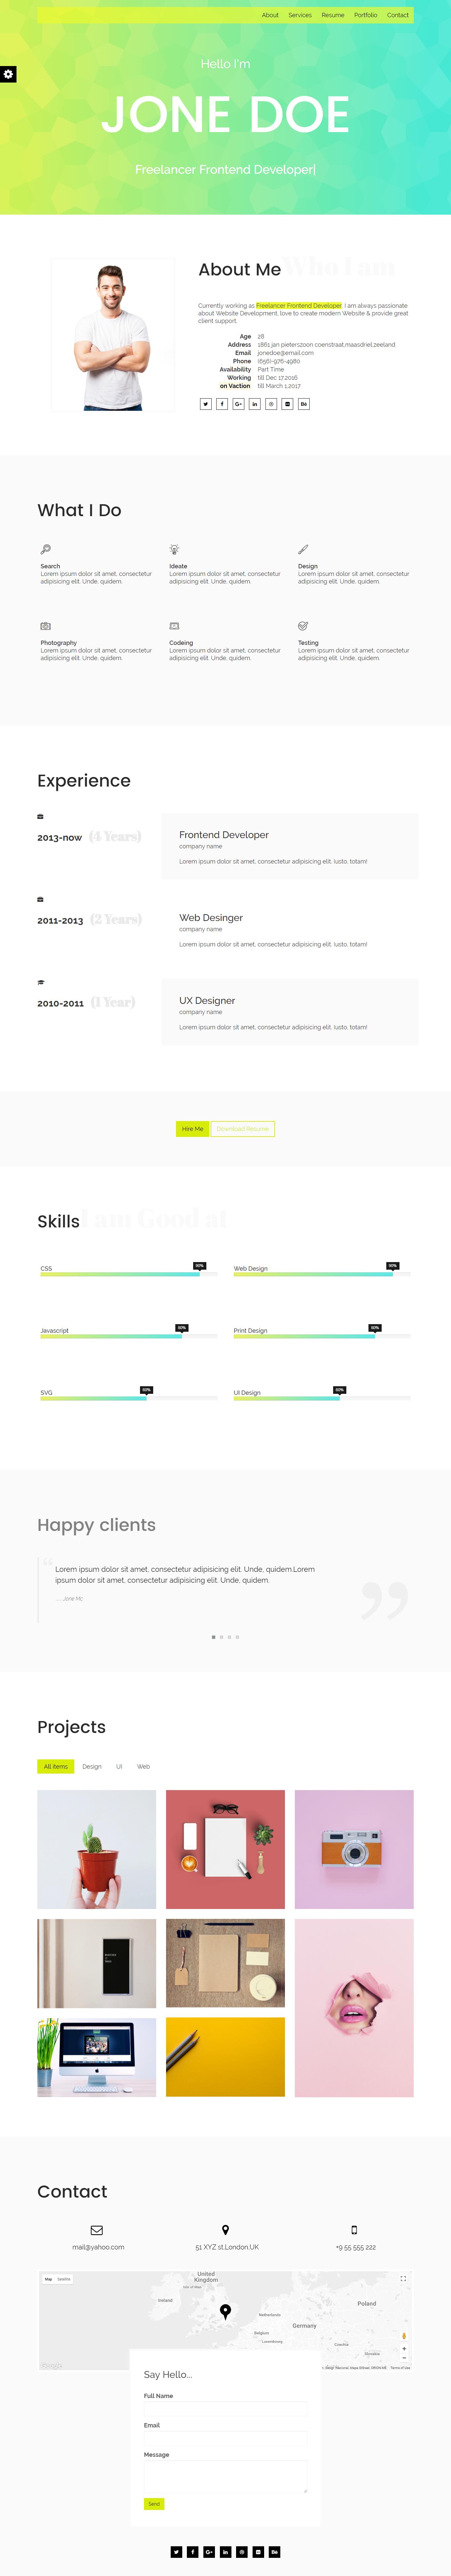 preview My CV- Responsive One Page CV/ Resume/ Portfolio Html Template (Personal) My CV- Responsive One Page CV/ Resume/ Portfolio Html Template (Personal) preview 1